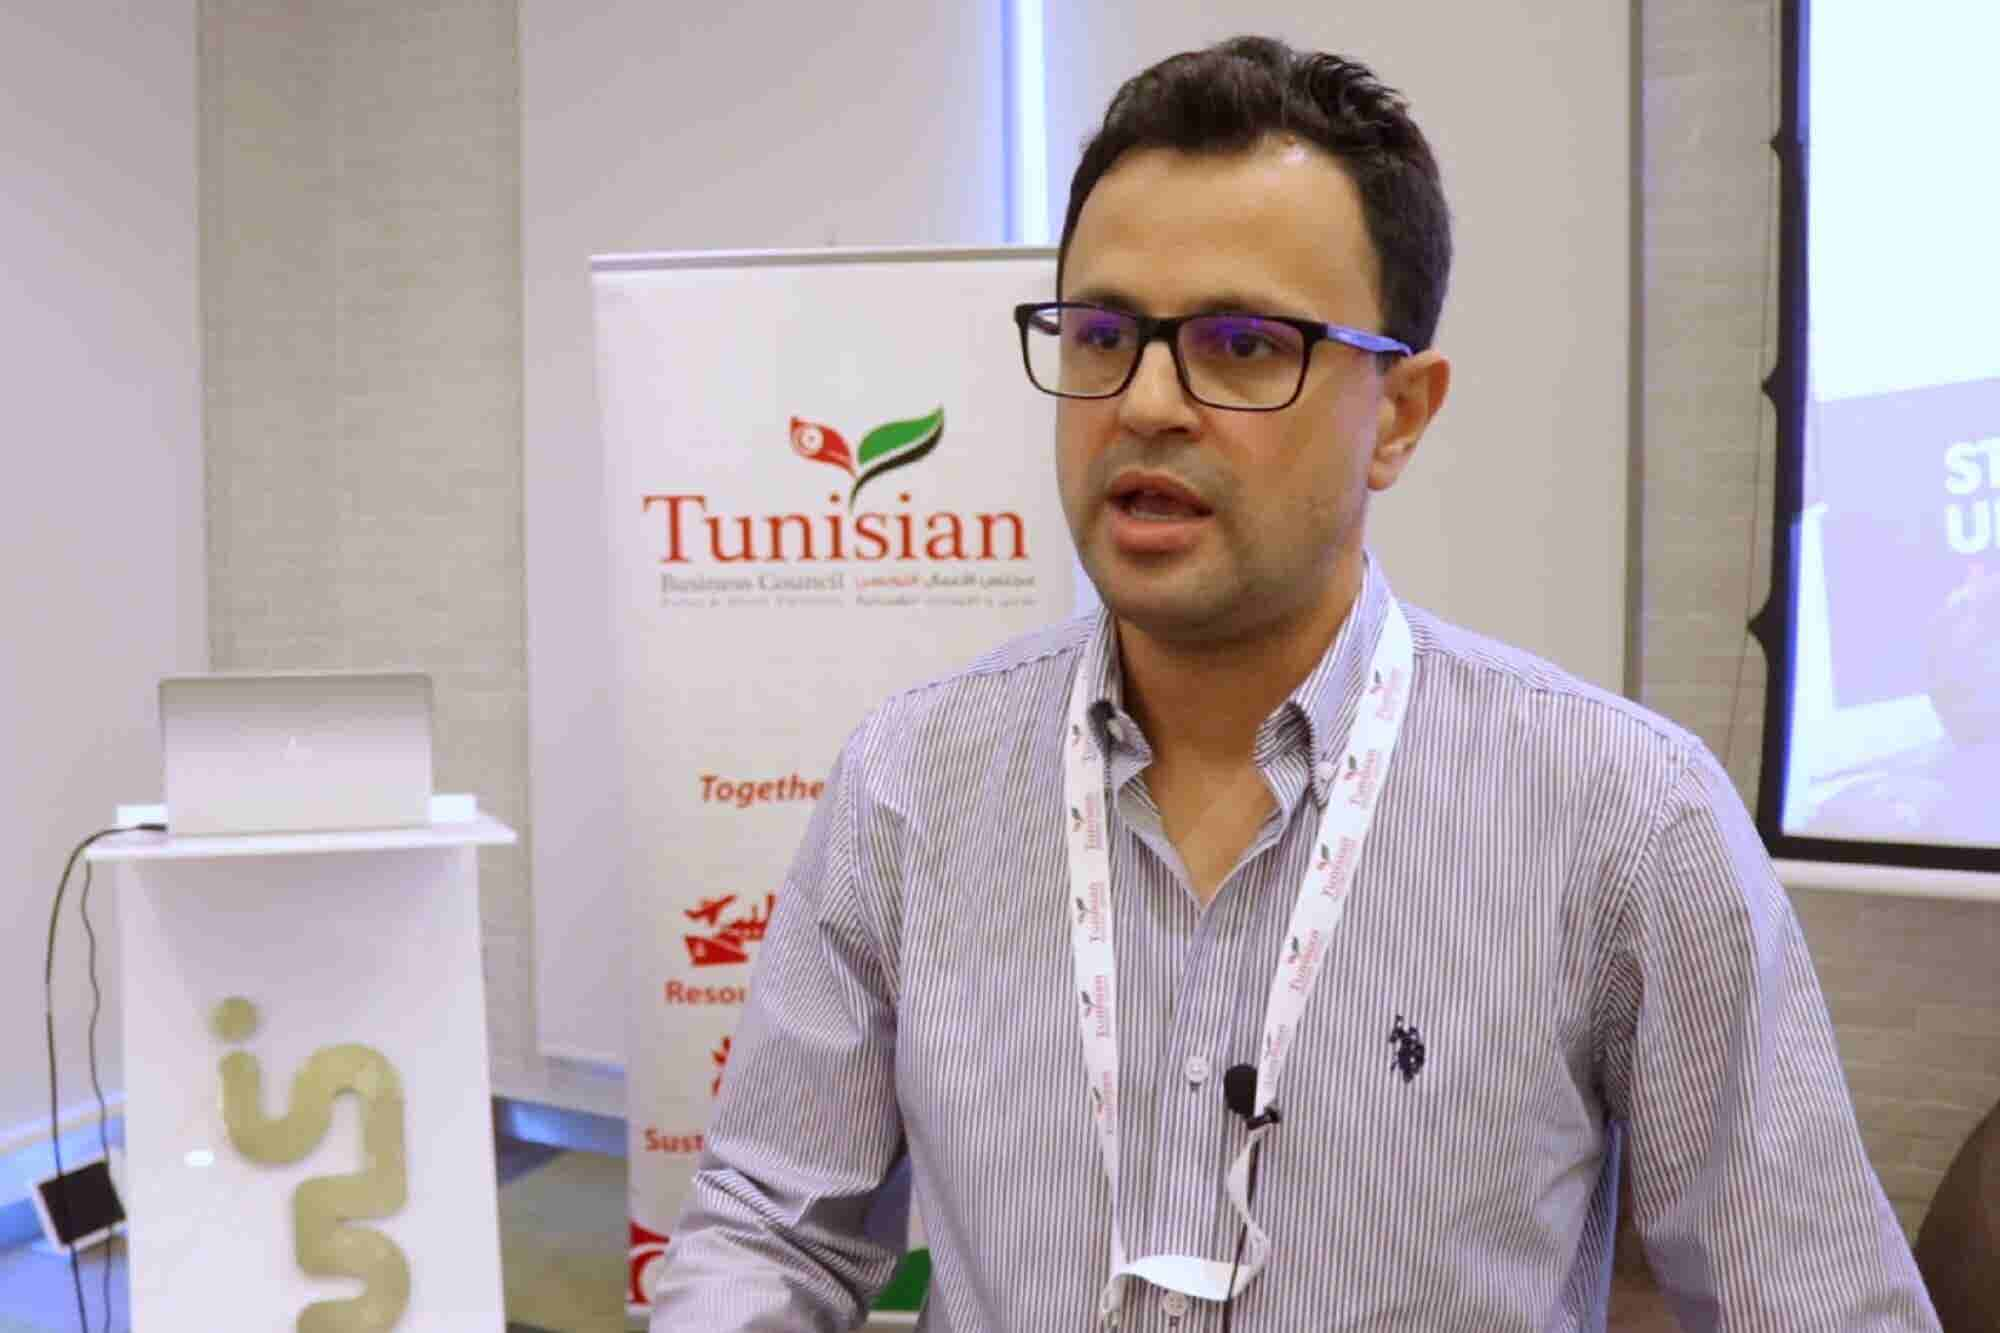 Tunisian Startup Forum Focuses On Opportunities For MENA Investors And Tunisia Entrepreneurs